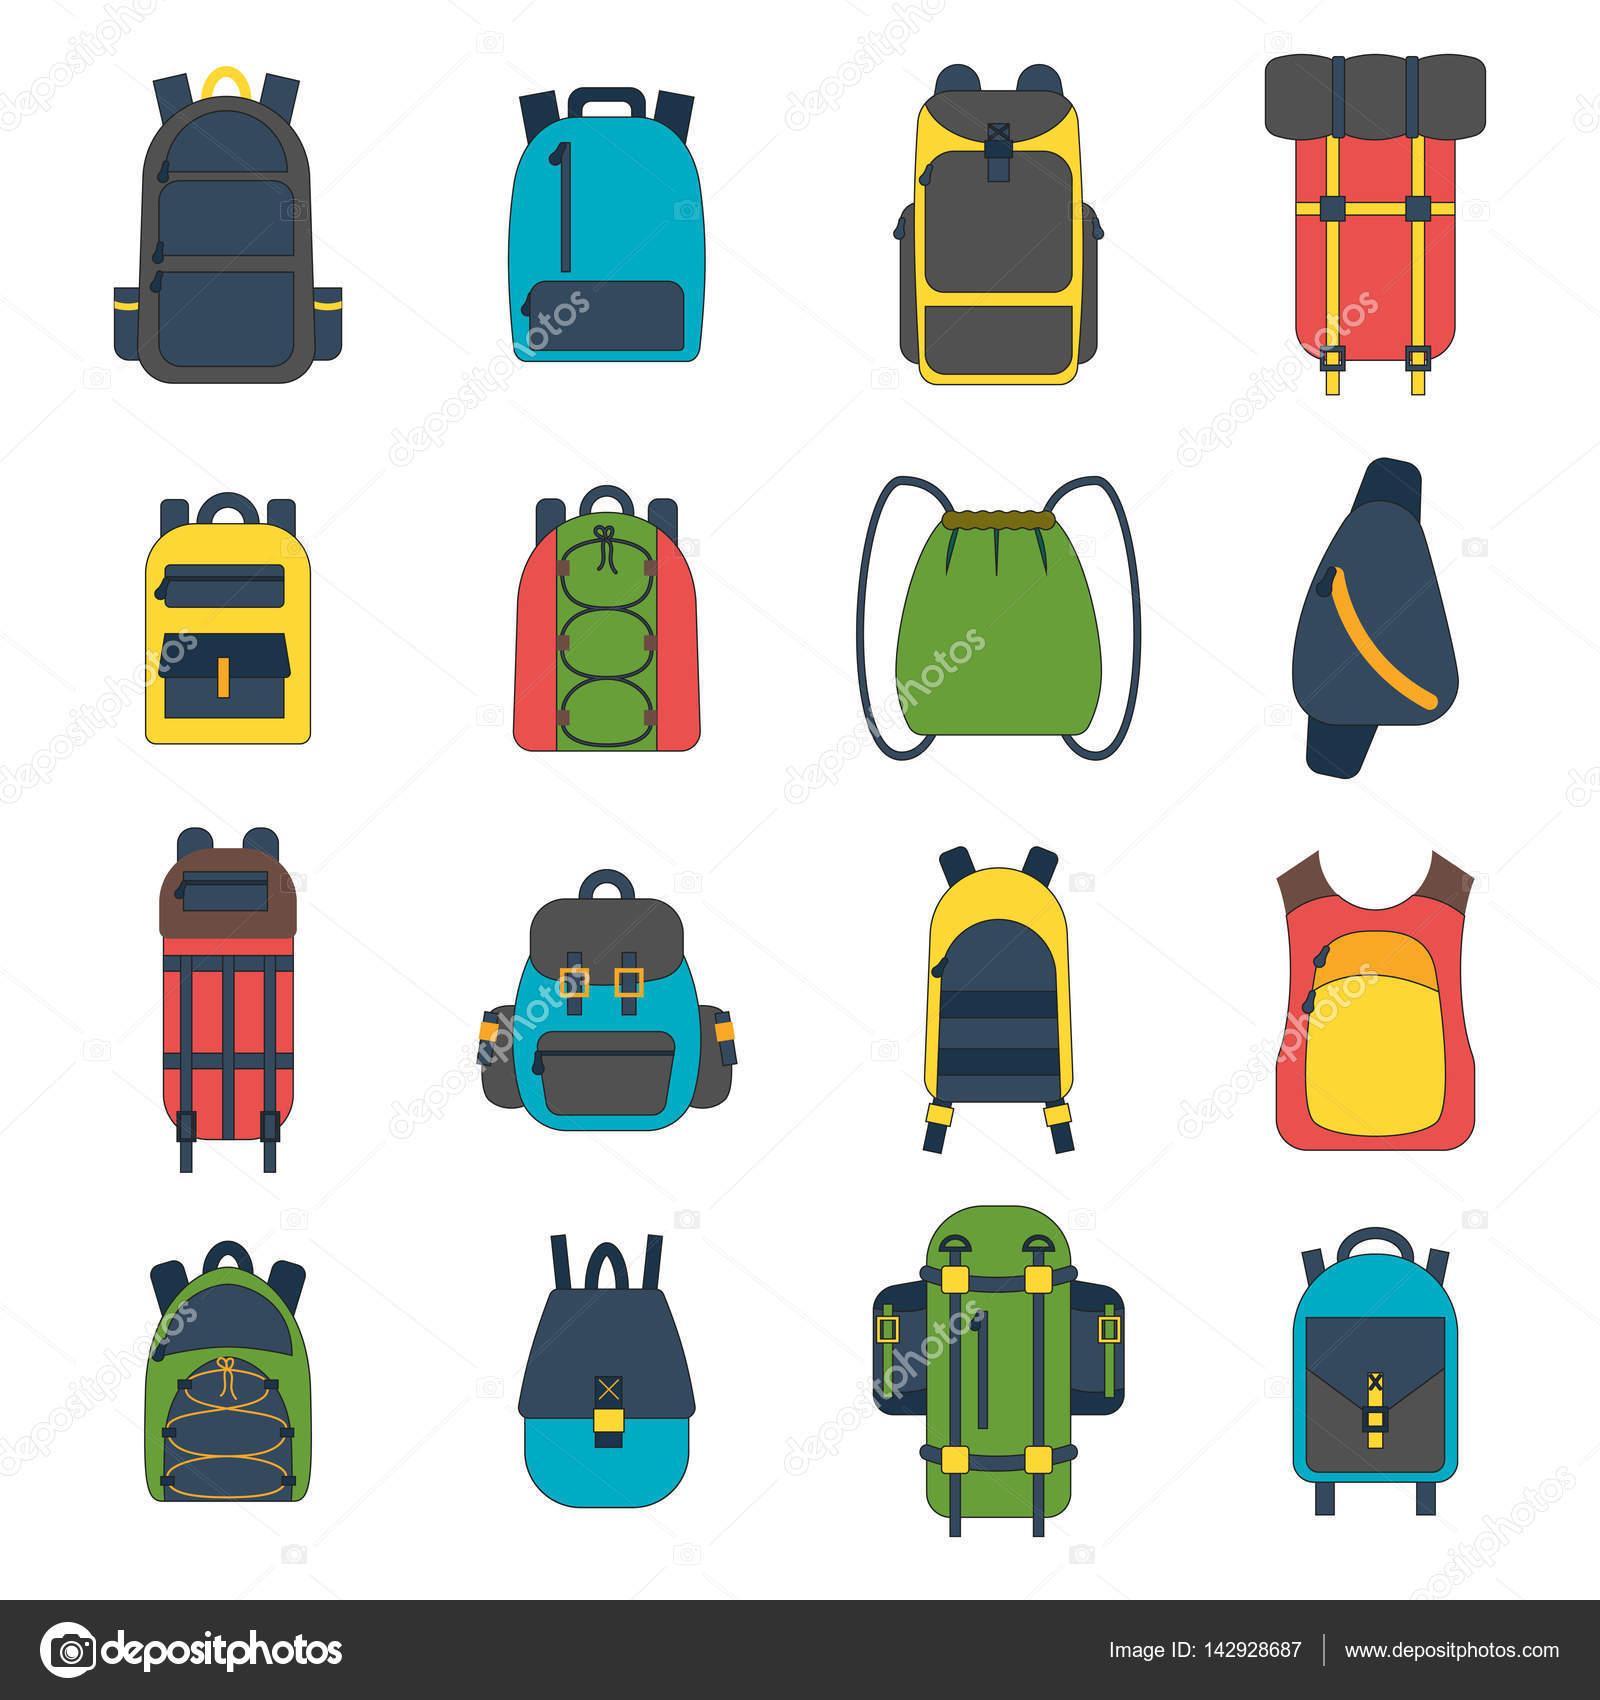 d4c52b8be3 Εικονογράφηση διάνυσμα καρτούν επίπεδη σακίδιο και αθλητισμού βαλίτσα.  Backpack σχολείο επίπεδη. Ορεινό τουριστικό εξοπλισμό. Πεζοπορία